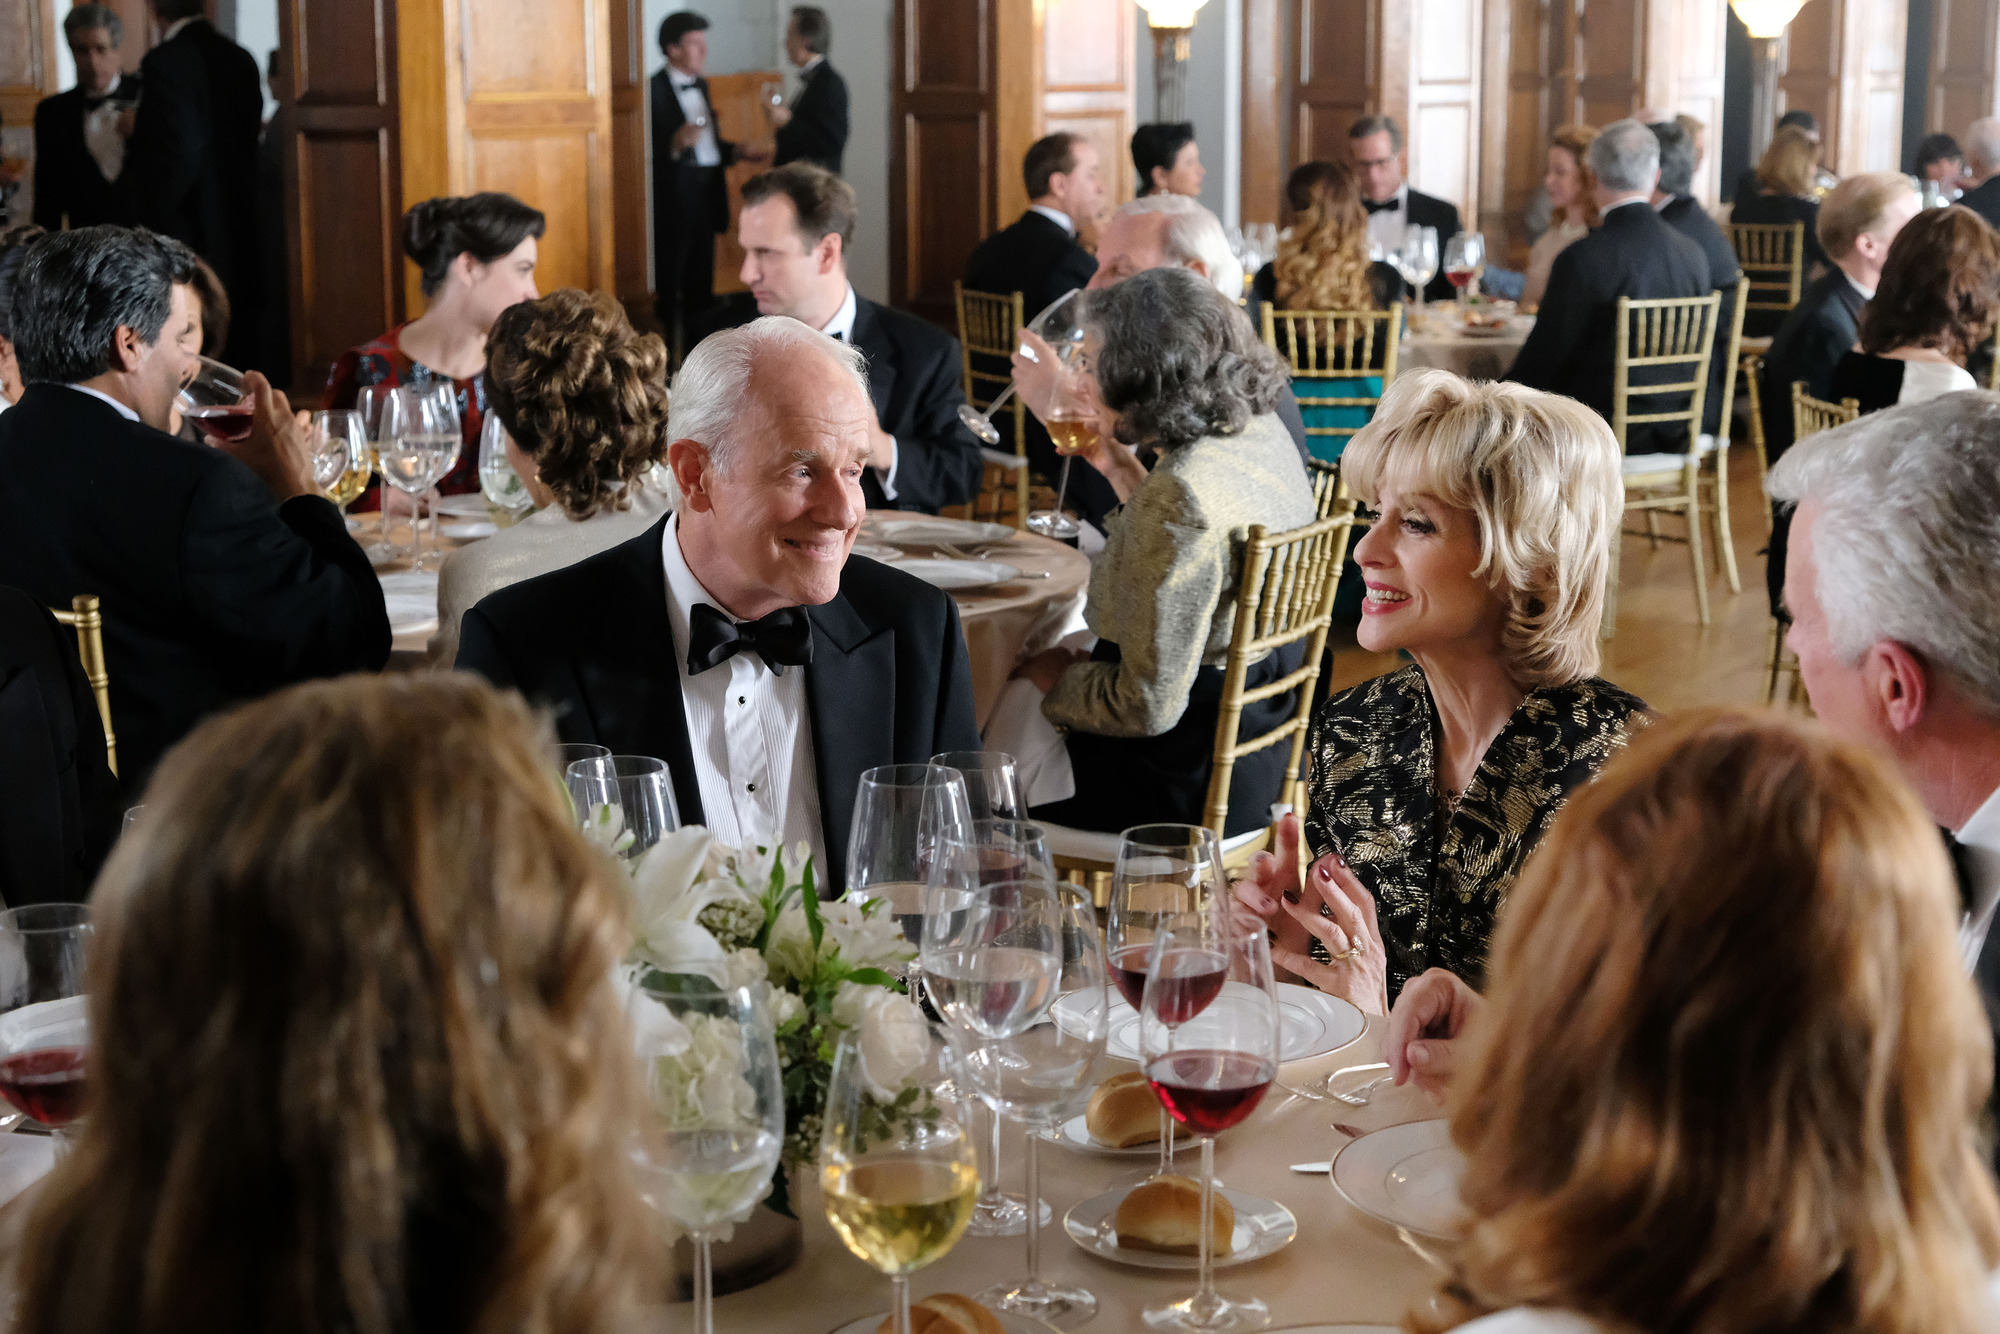 Lee (Mike Farrell) & Marilyn Miglin (Judith Light)